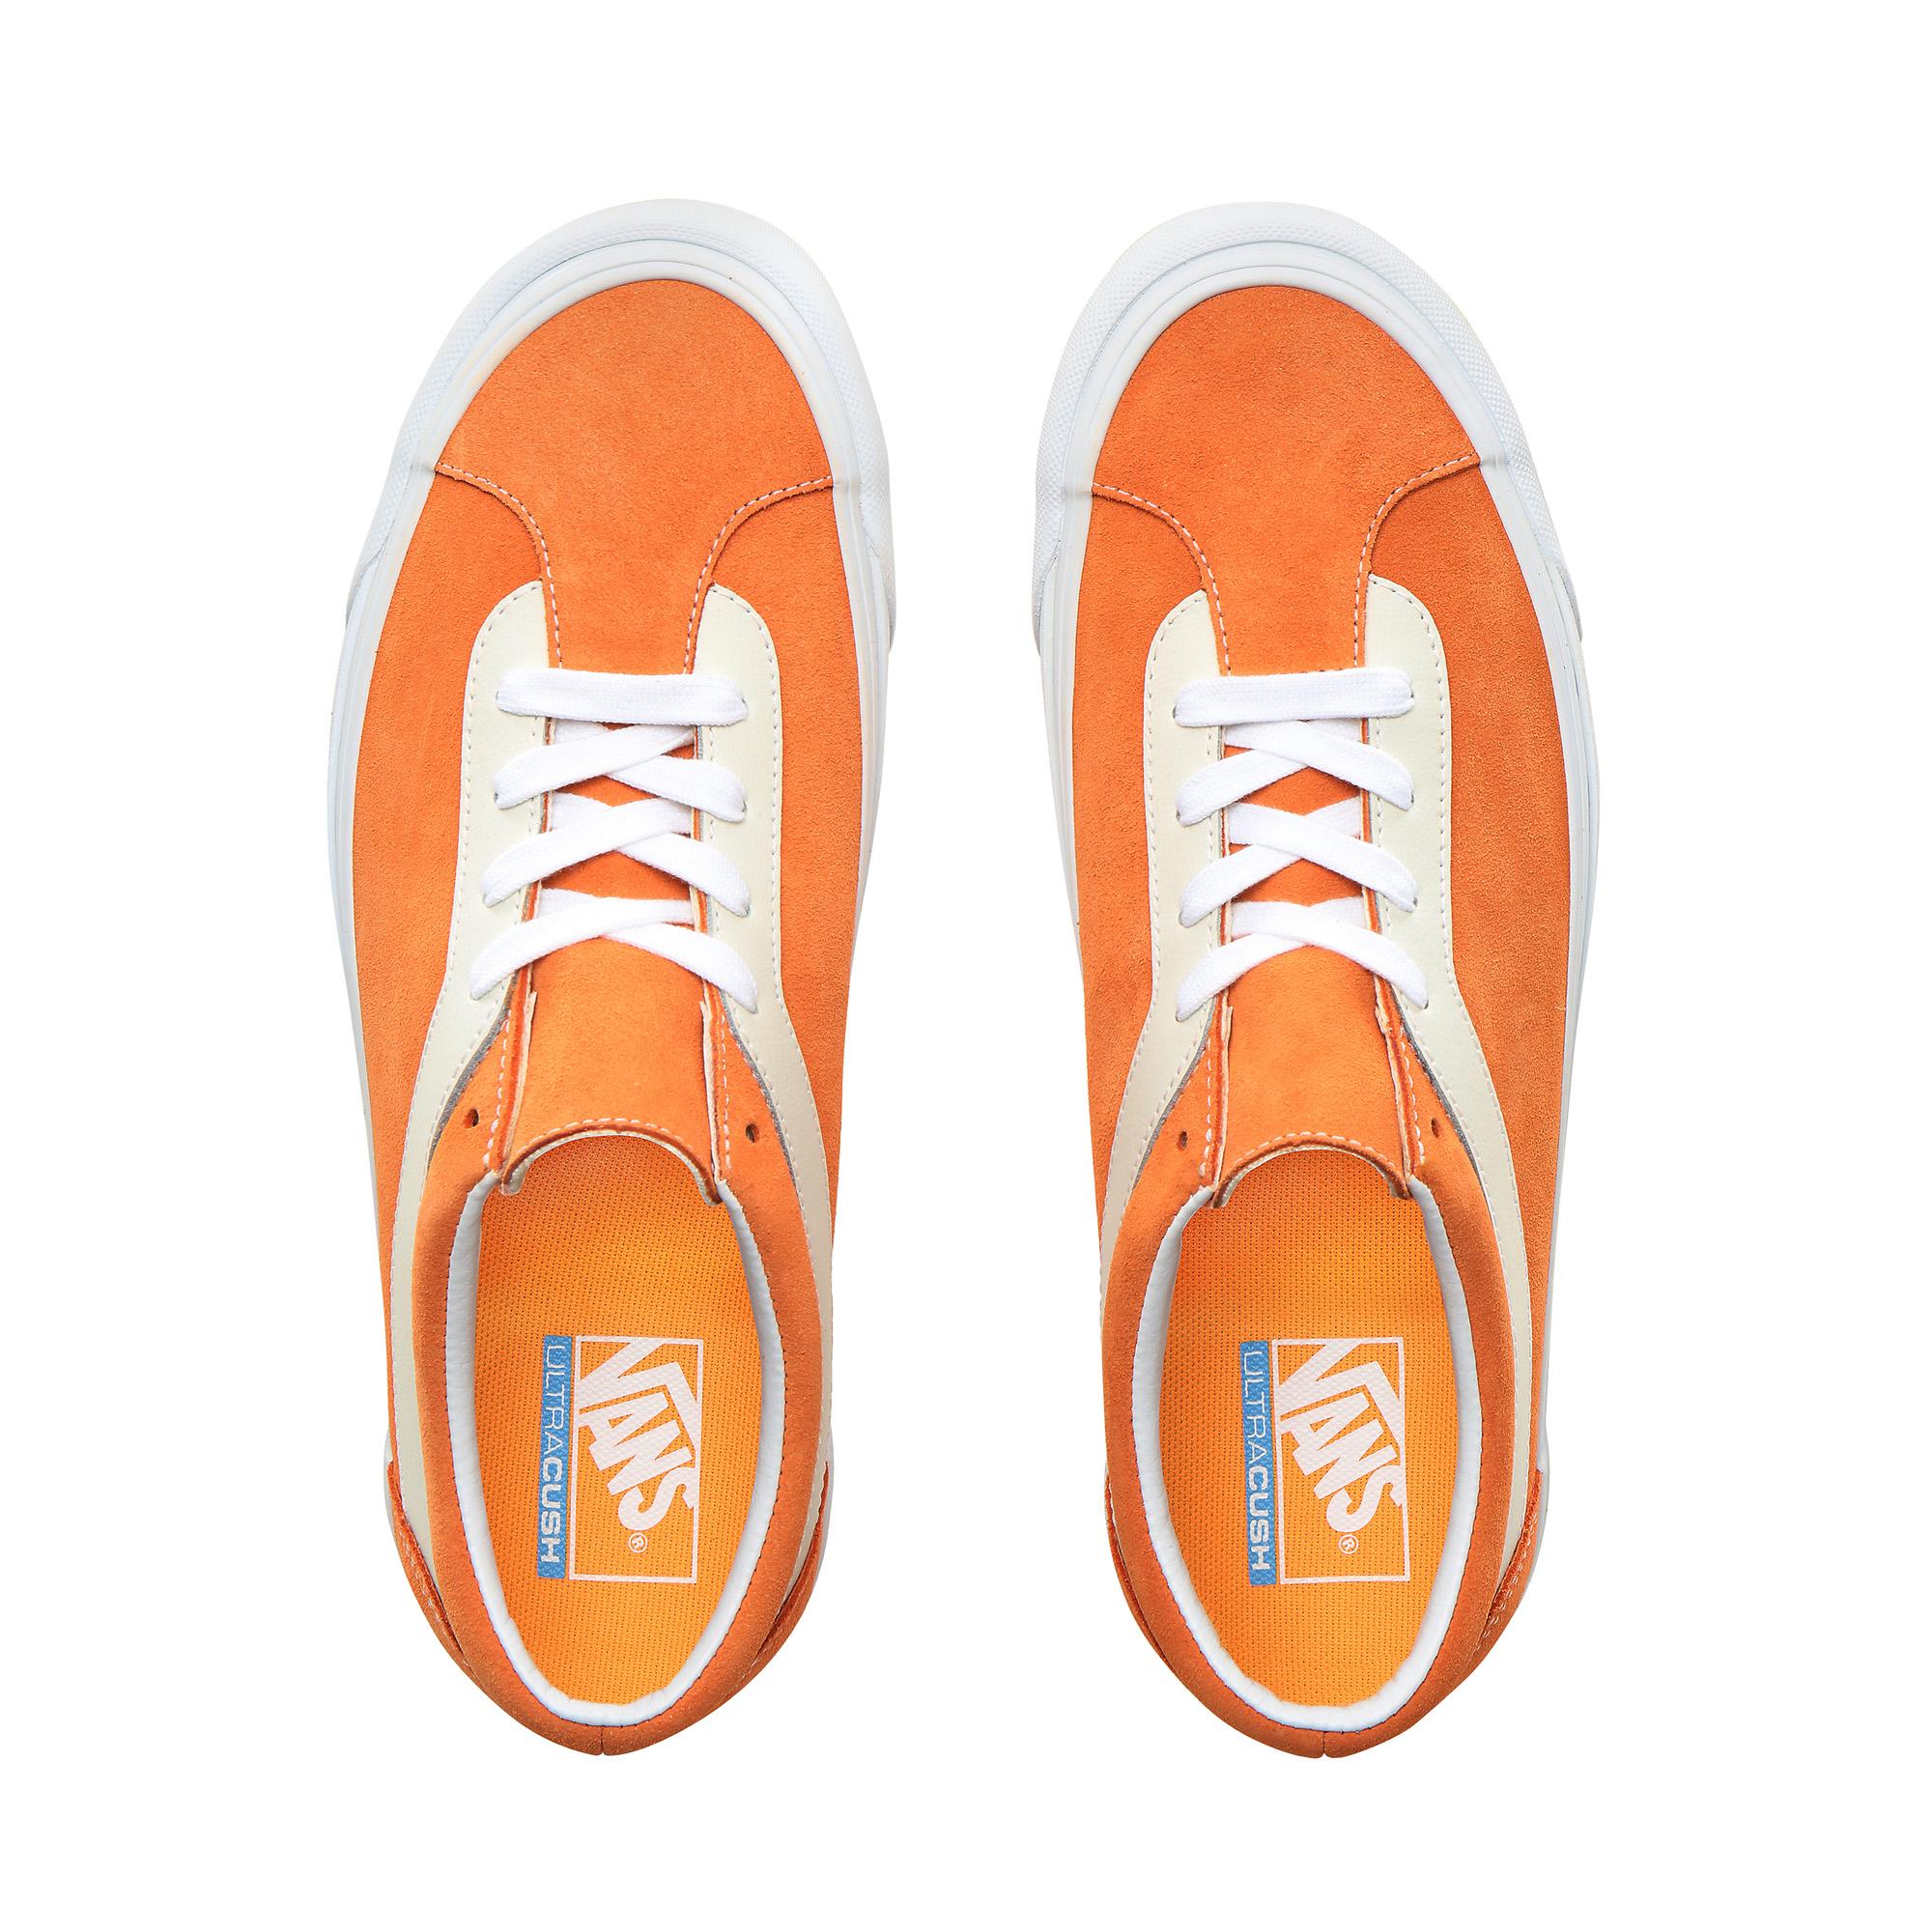 Фото 2 - Кеды Bold Ni оранжевого цвета